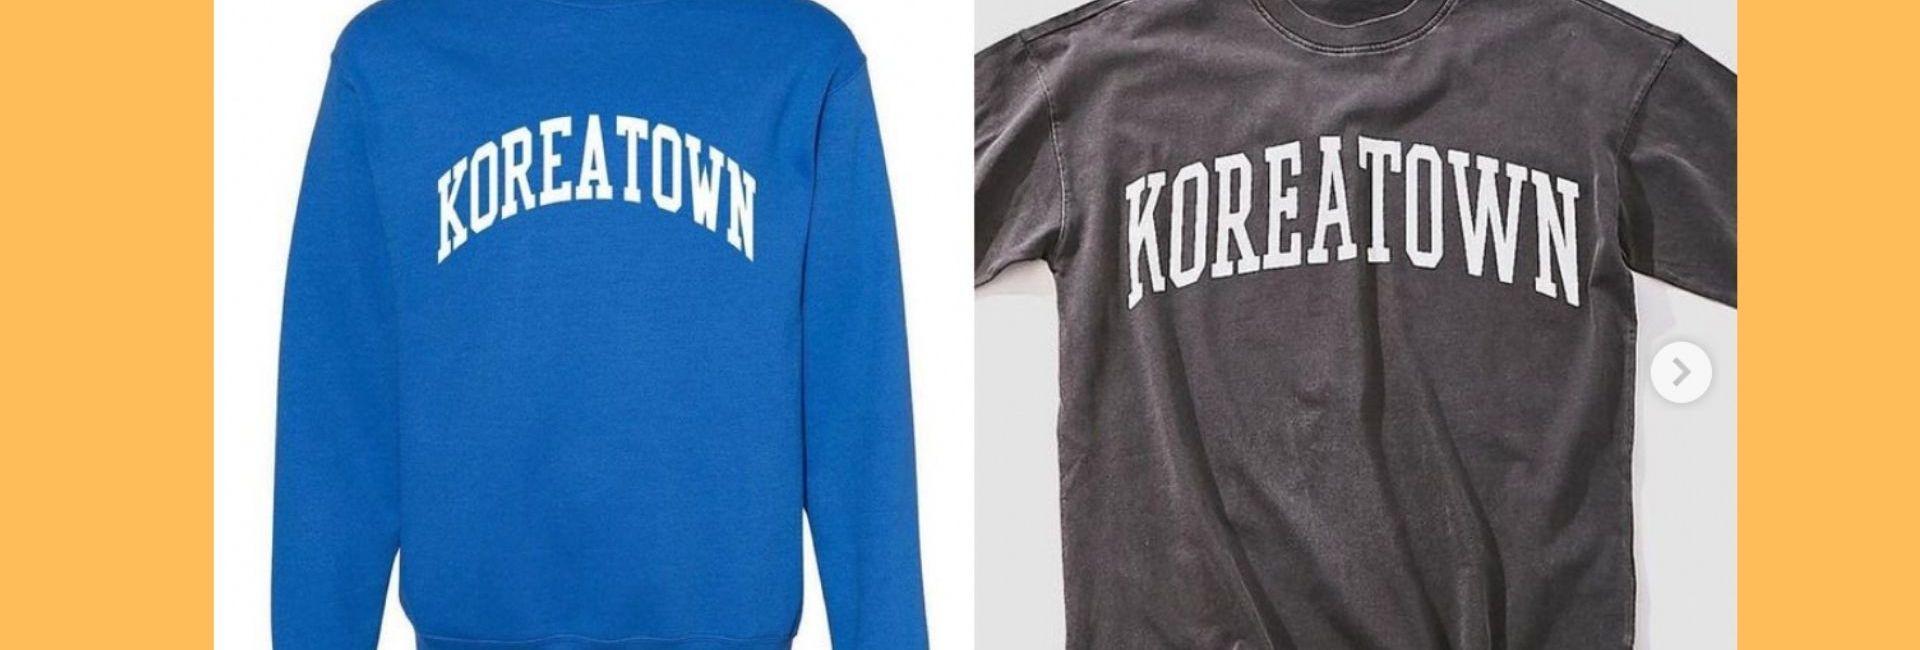 Forever-21-copie-Koreatown